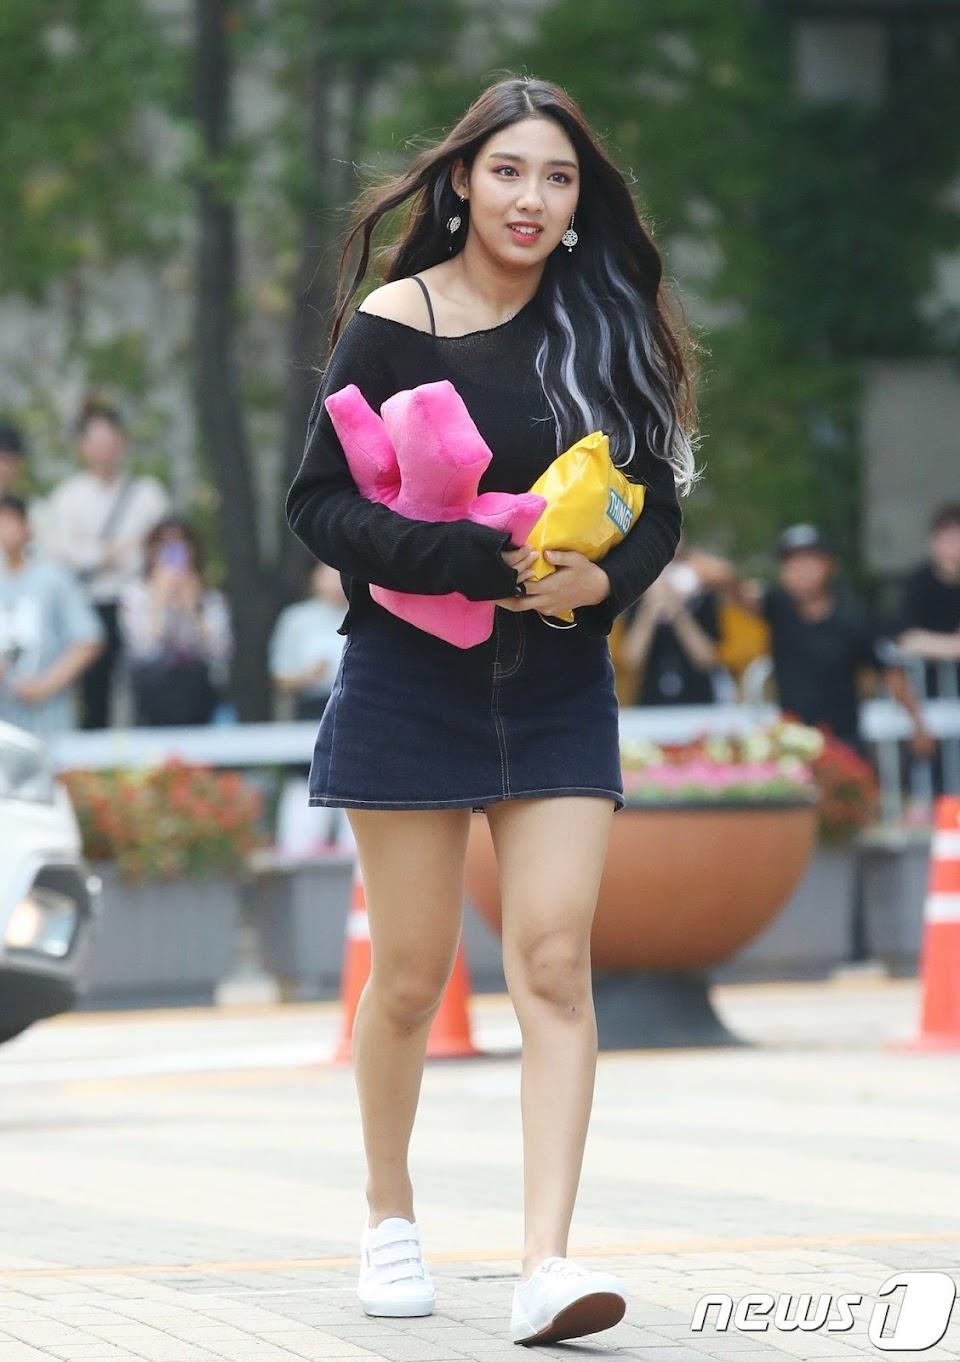 gaeunchowon_18